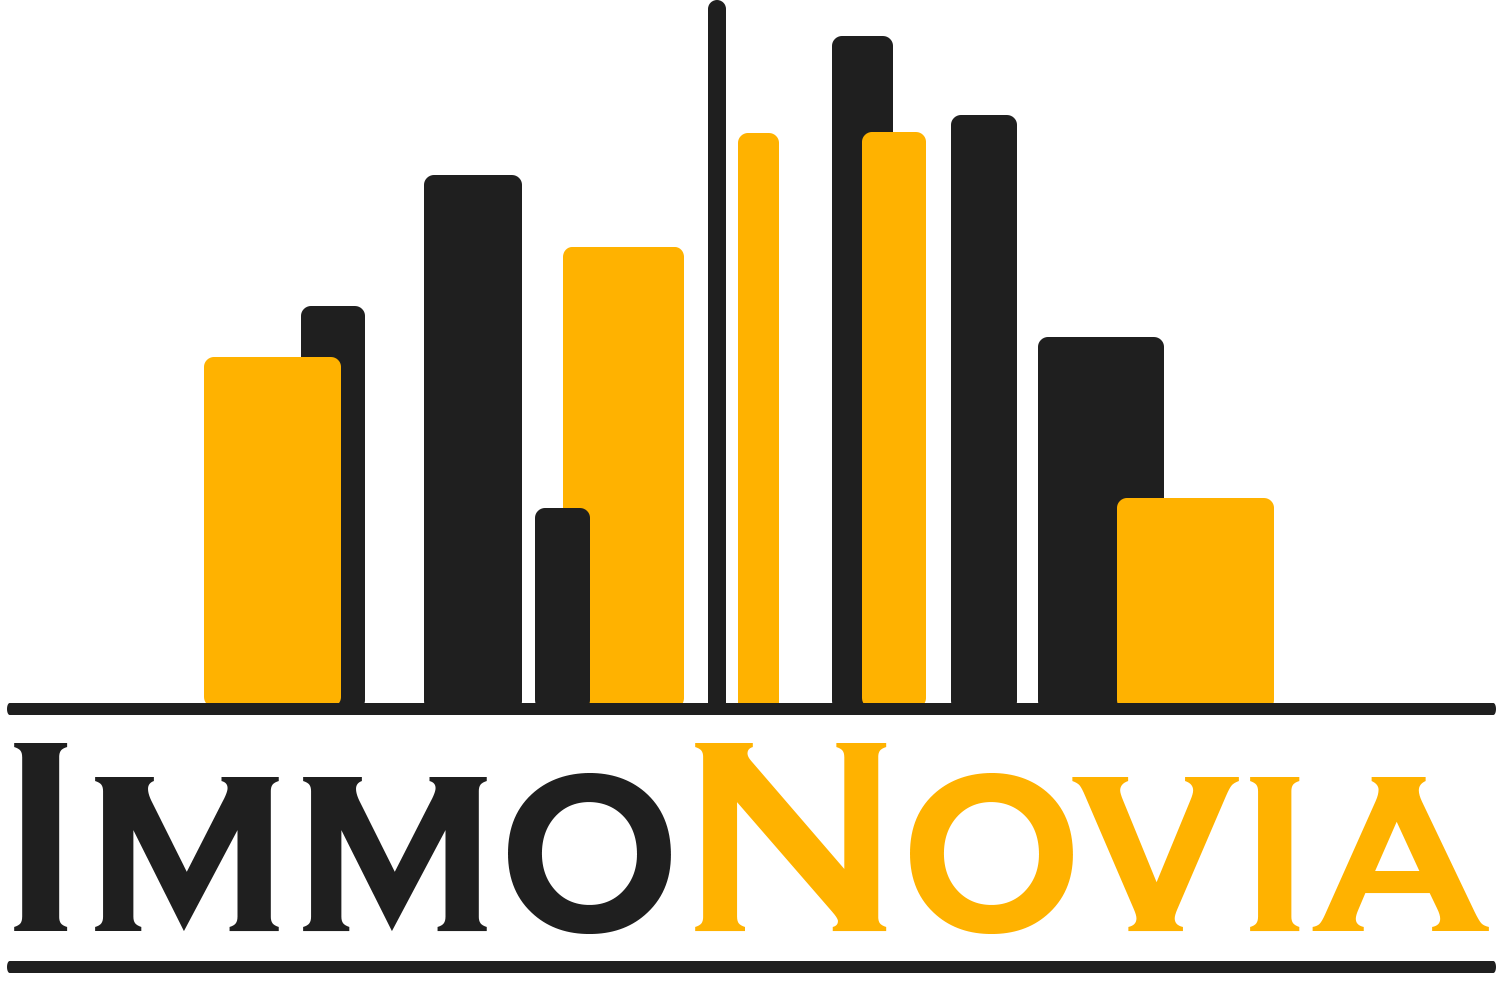 ImmoNovia